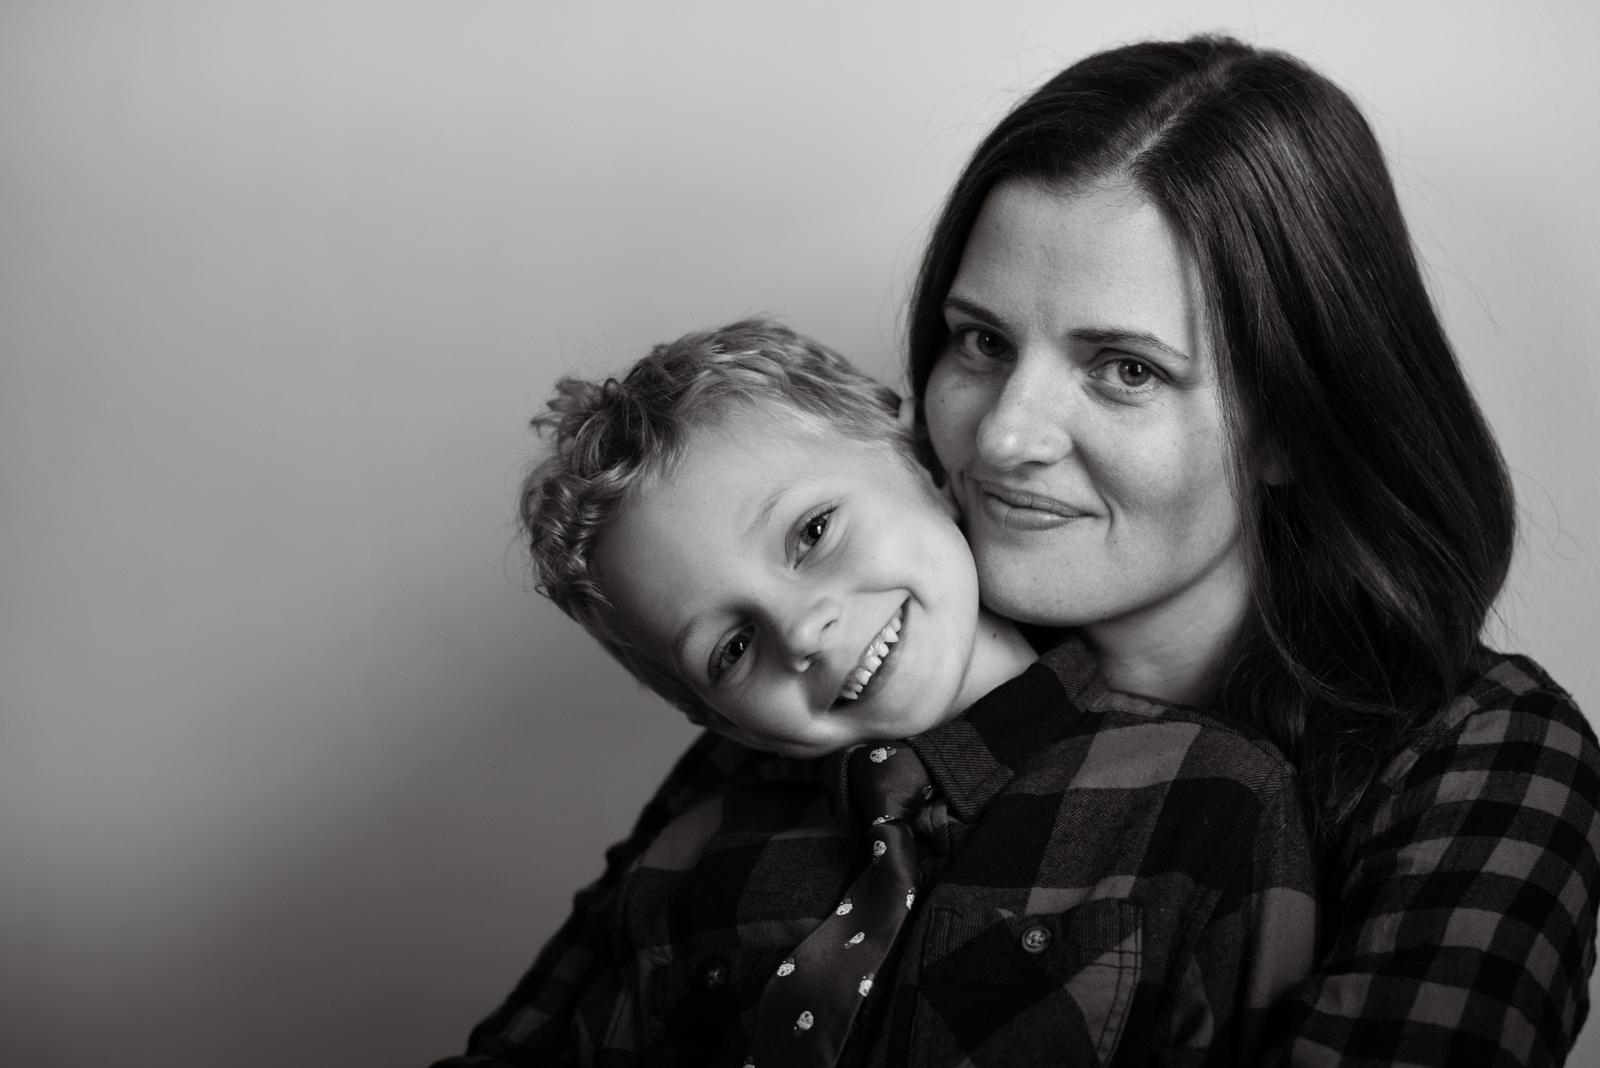 11202018-Erin-JuliaLuckettPhotography-15.jpg